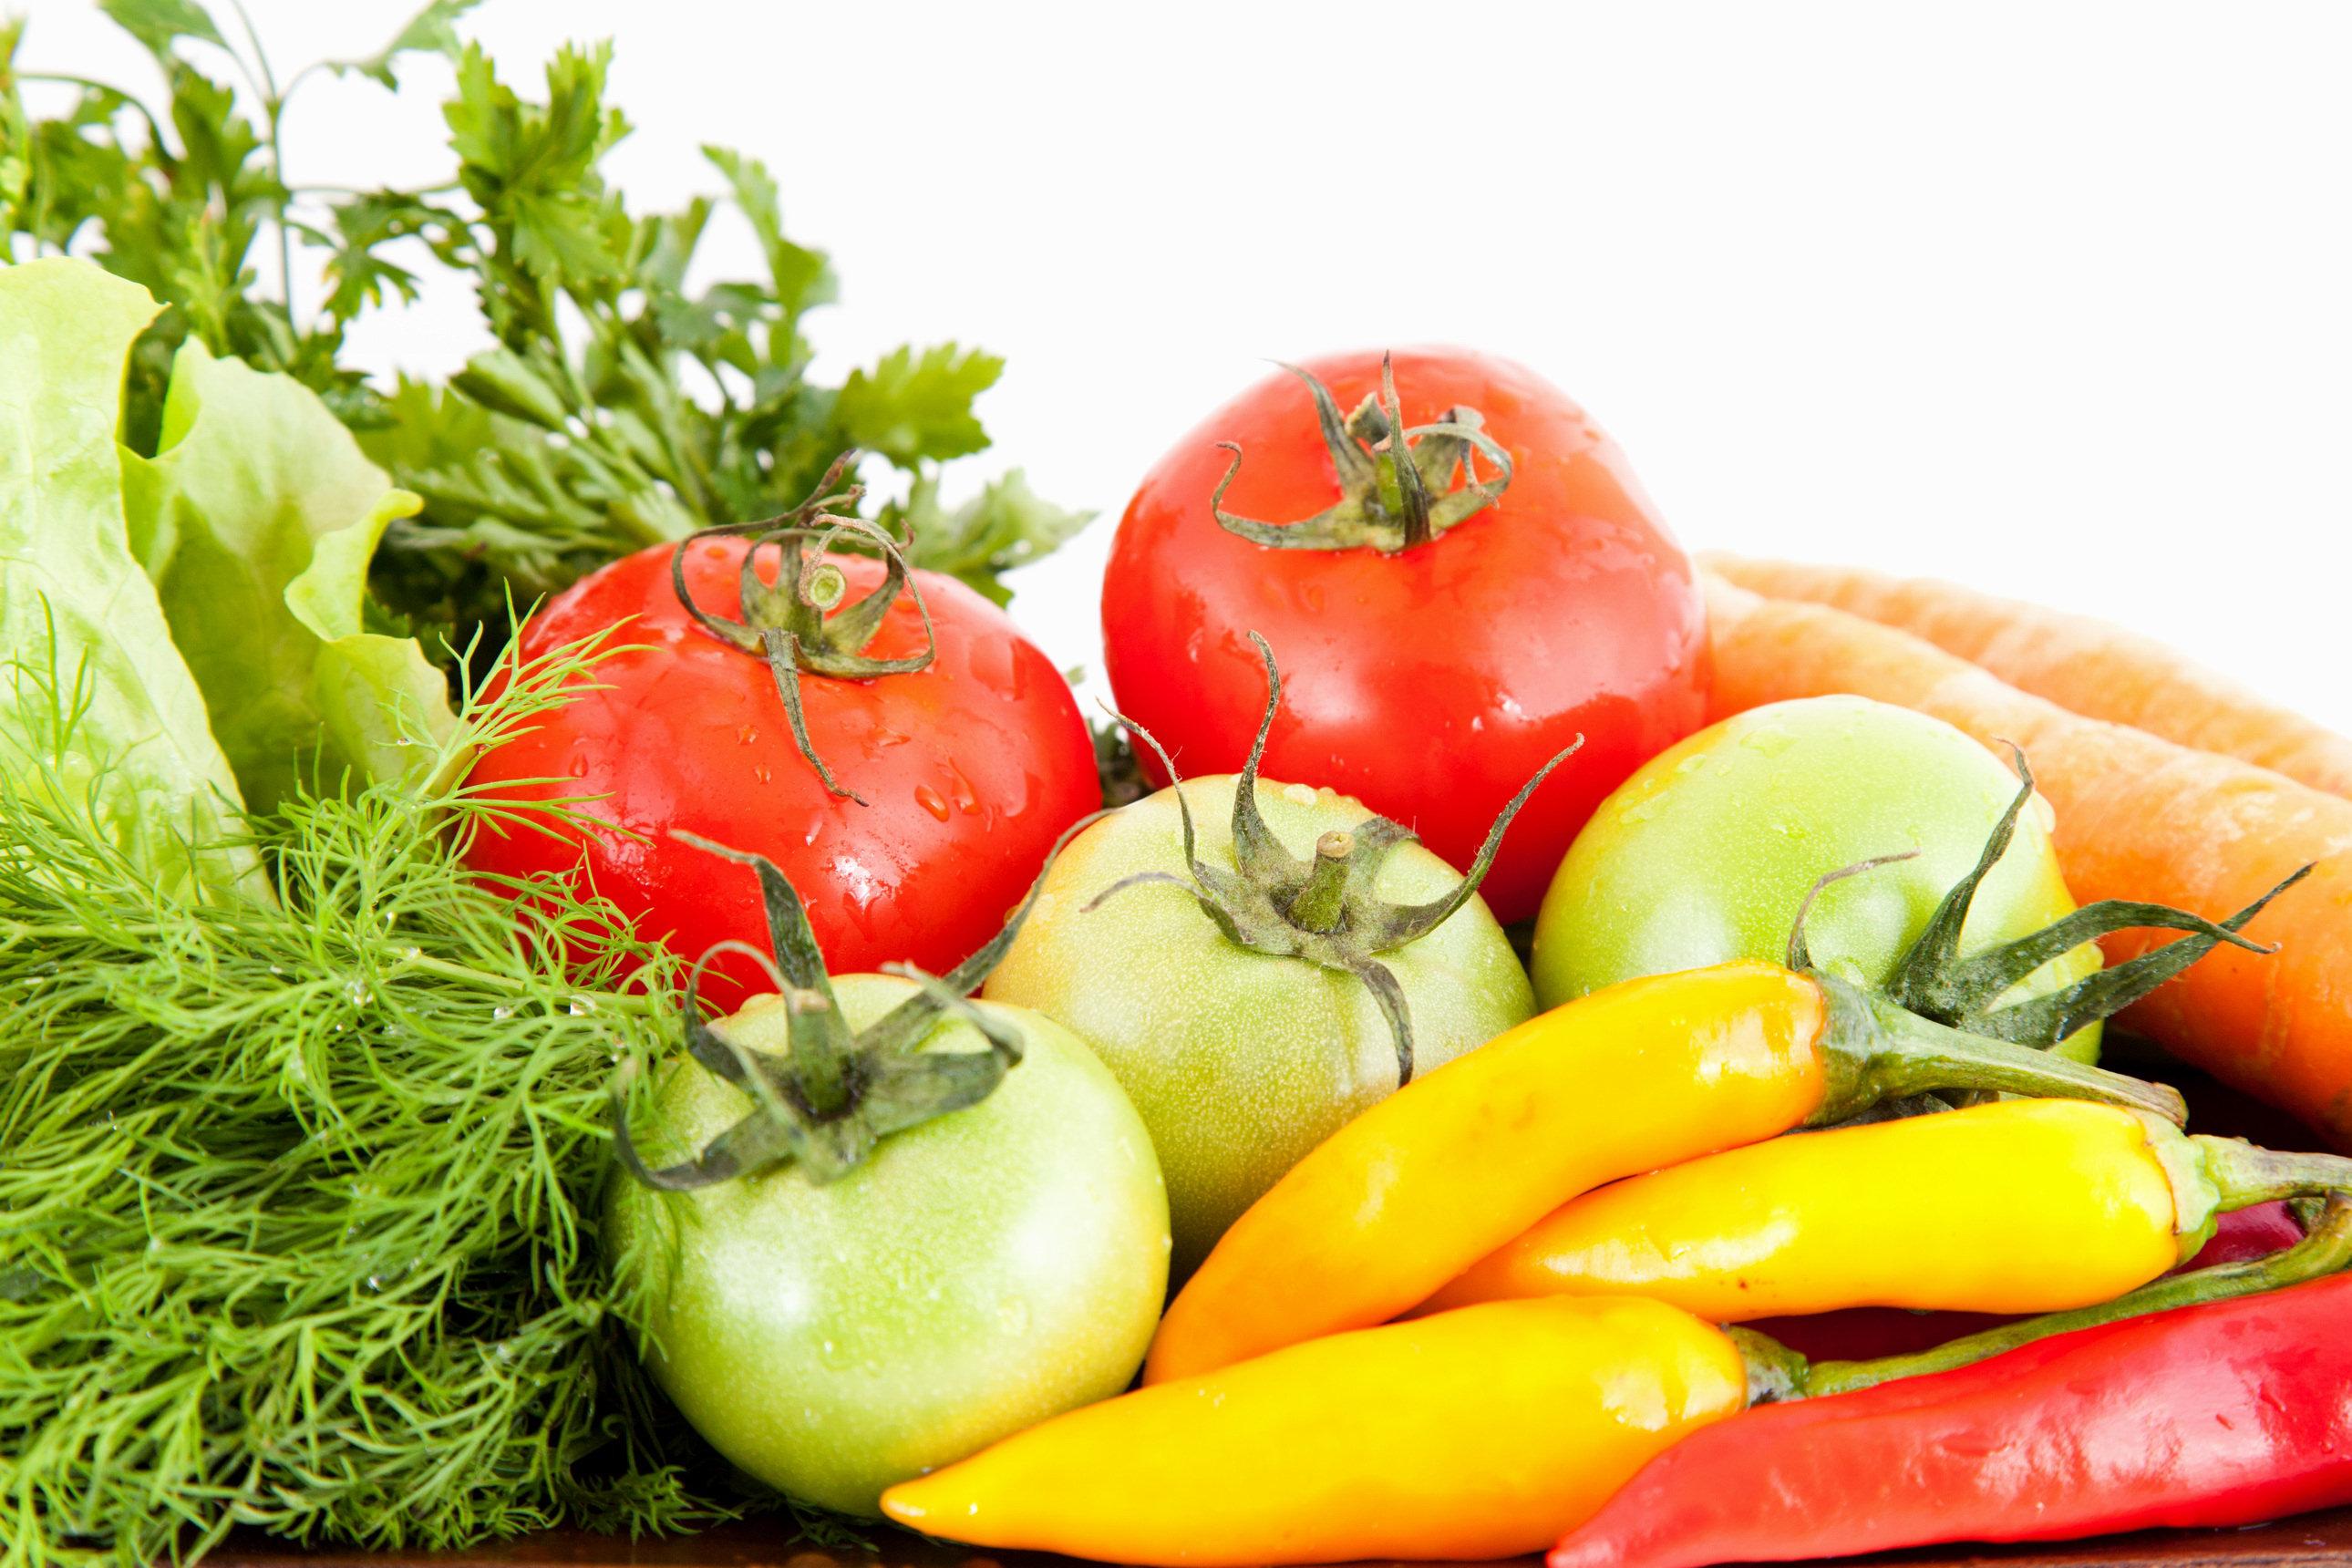 Vegetables Wallpaper 2580x1720